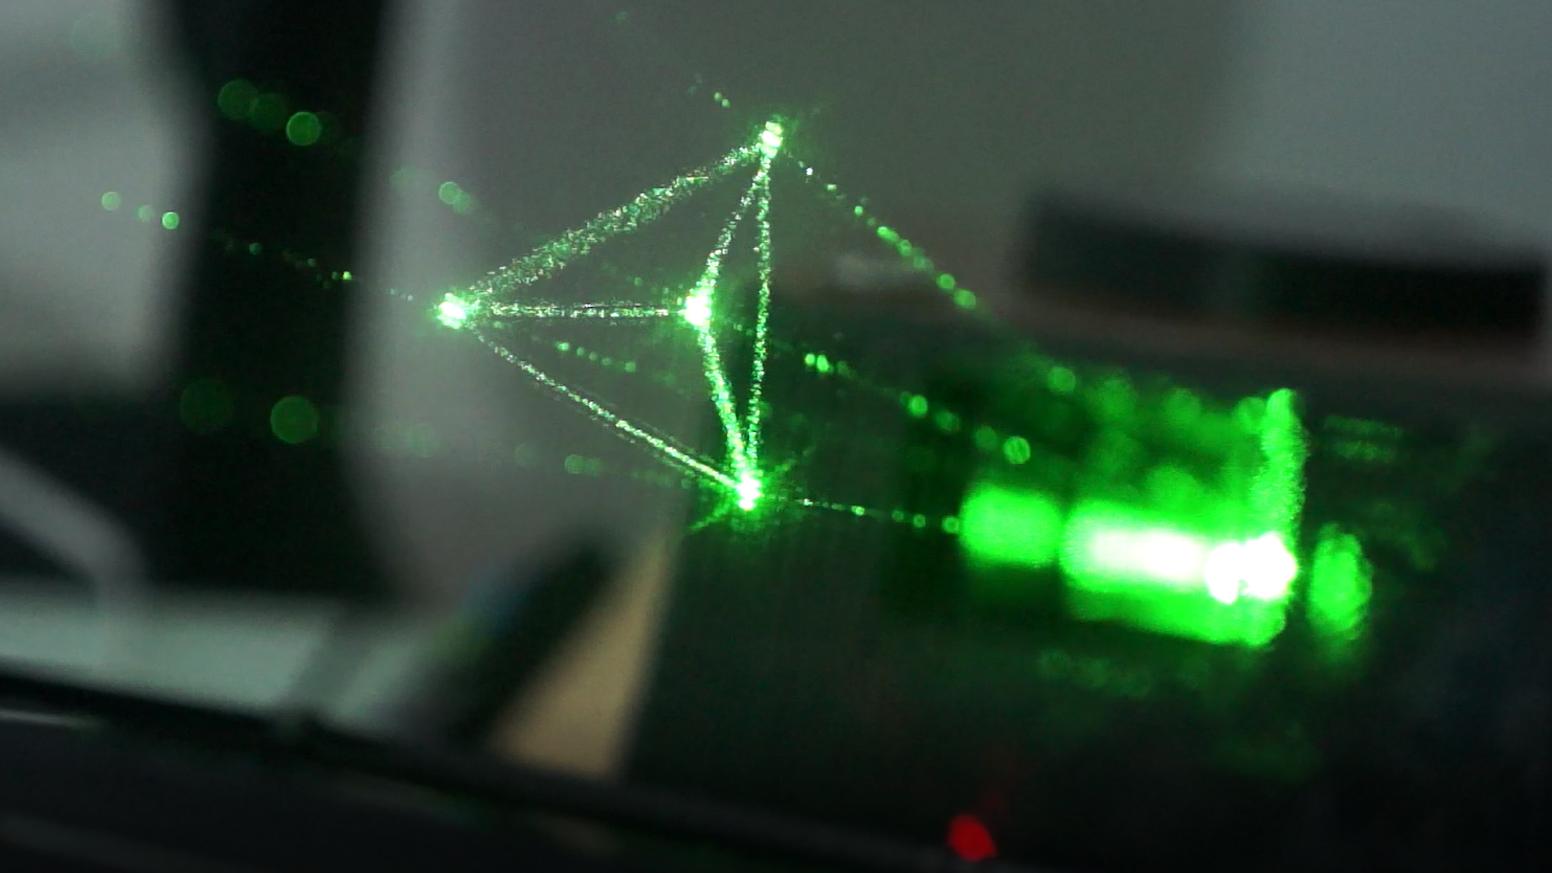 Holovect Holographic Vector Display By Jaime Ruiz Avila